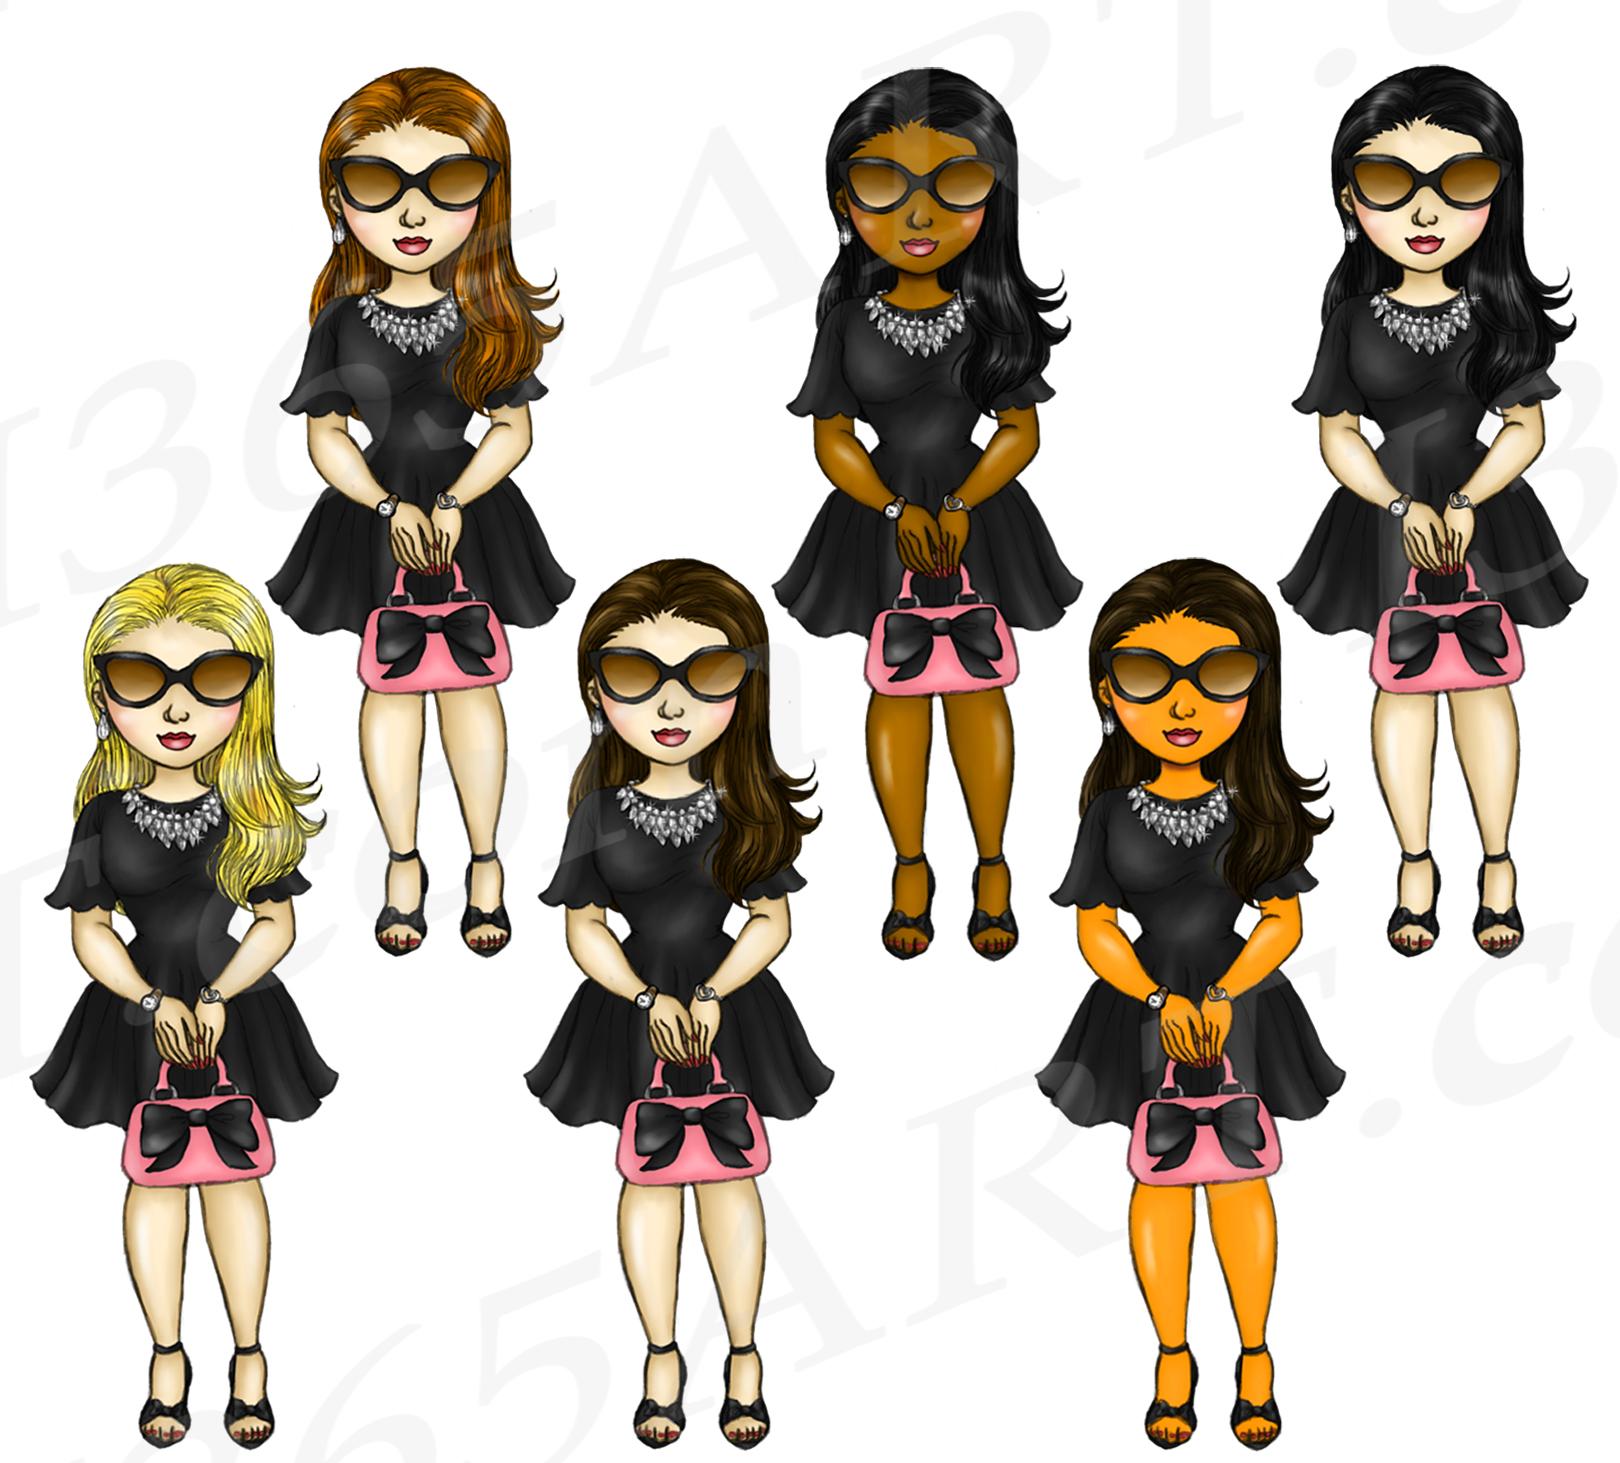 Bad Bae Planner Girls Clipart, Black Dress, Fashion Dolls example image 3